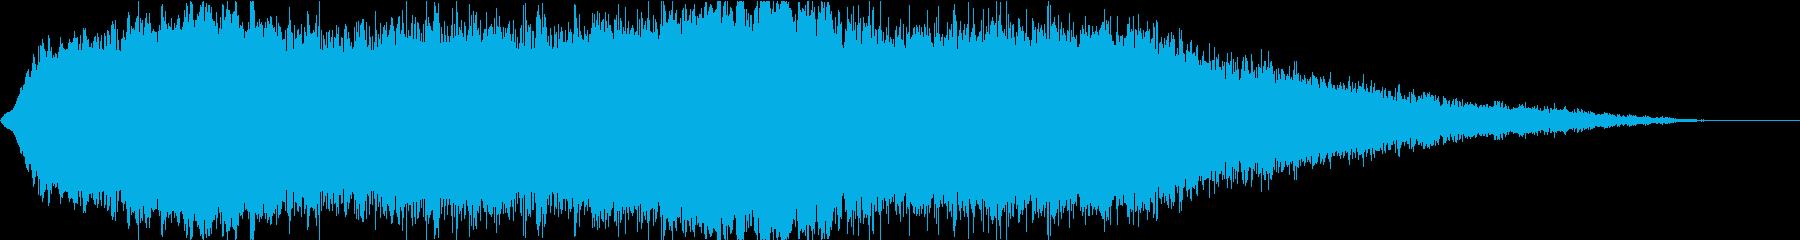 SFで新しいモノが誕生する時の神秘的な音の再生済みの波形